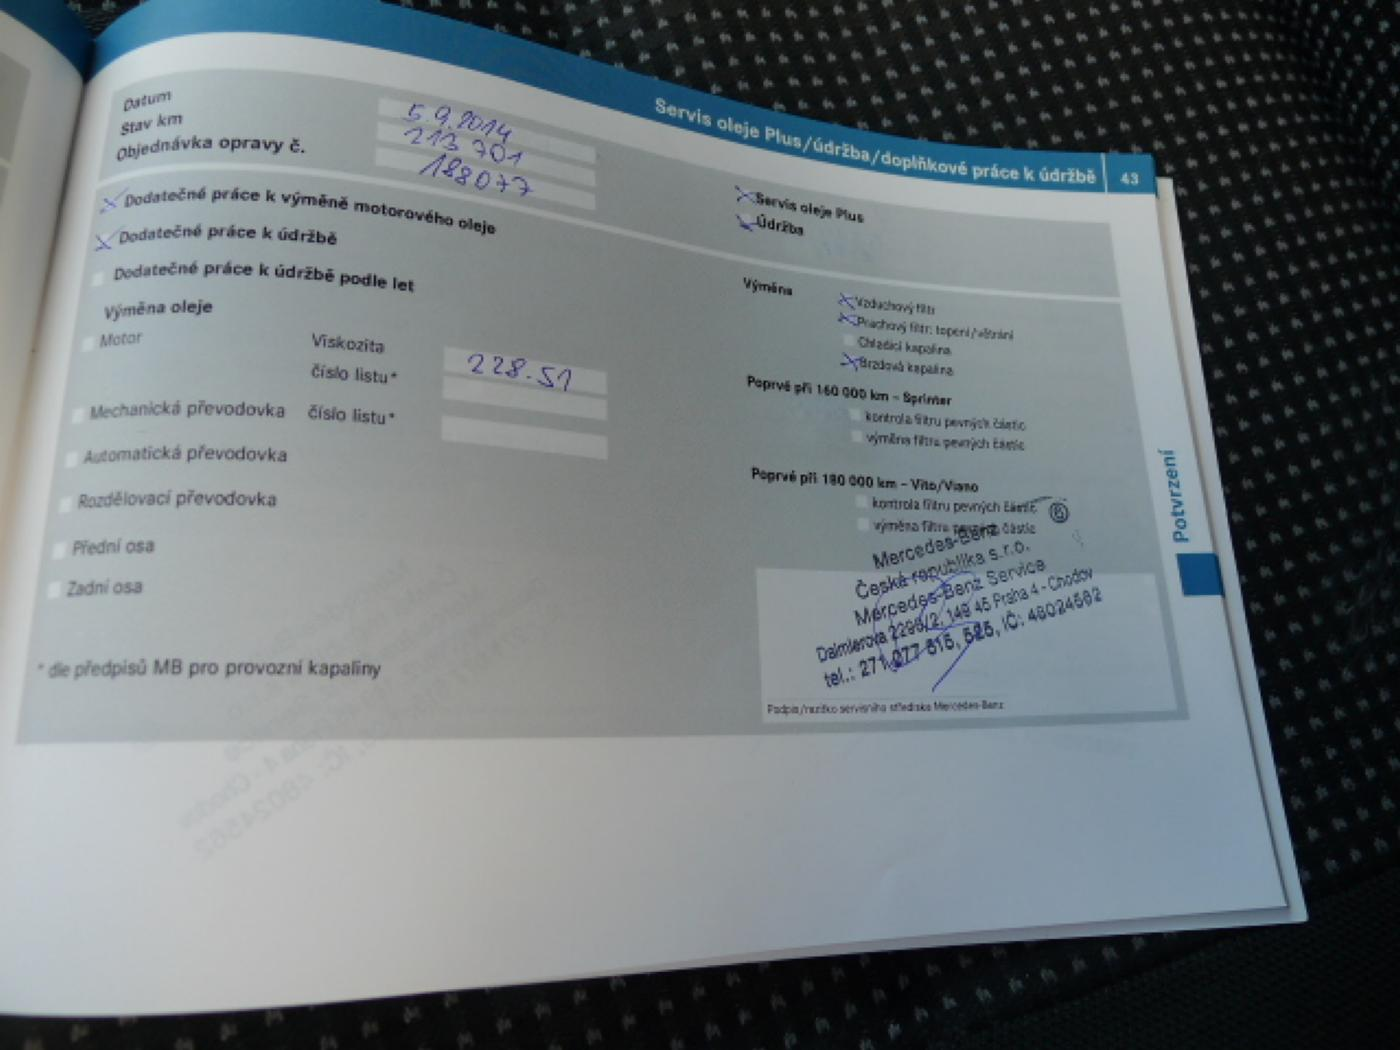 Mercedes-Benz Sprinter 319 CDI Maxi XXL + Klima Akce!!!! - 22